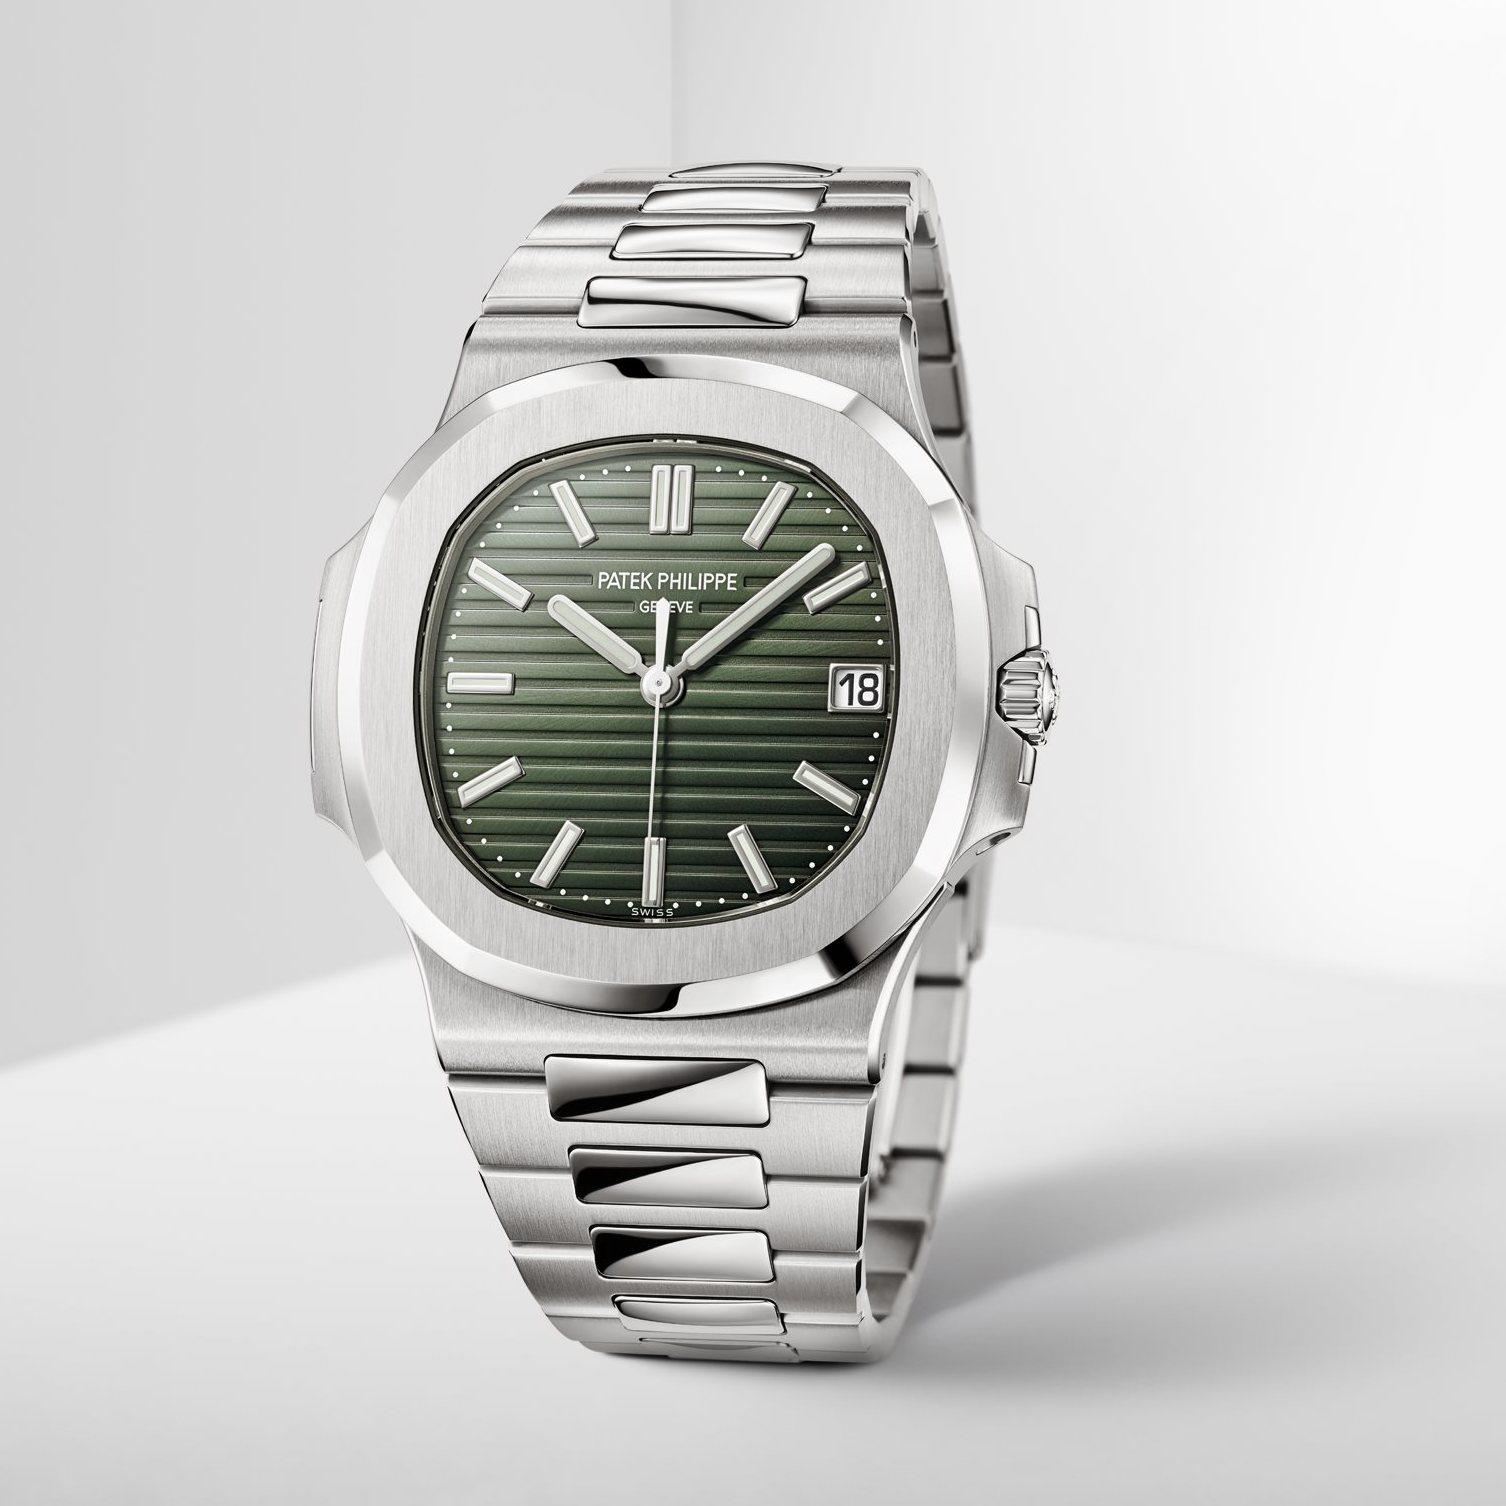 2021 Patek Philippe Nautilus 5711 Green Dial - 5711/1A-014